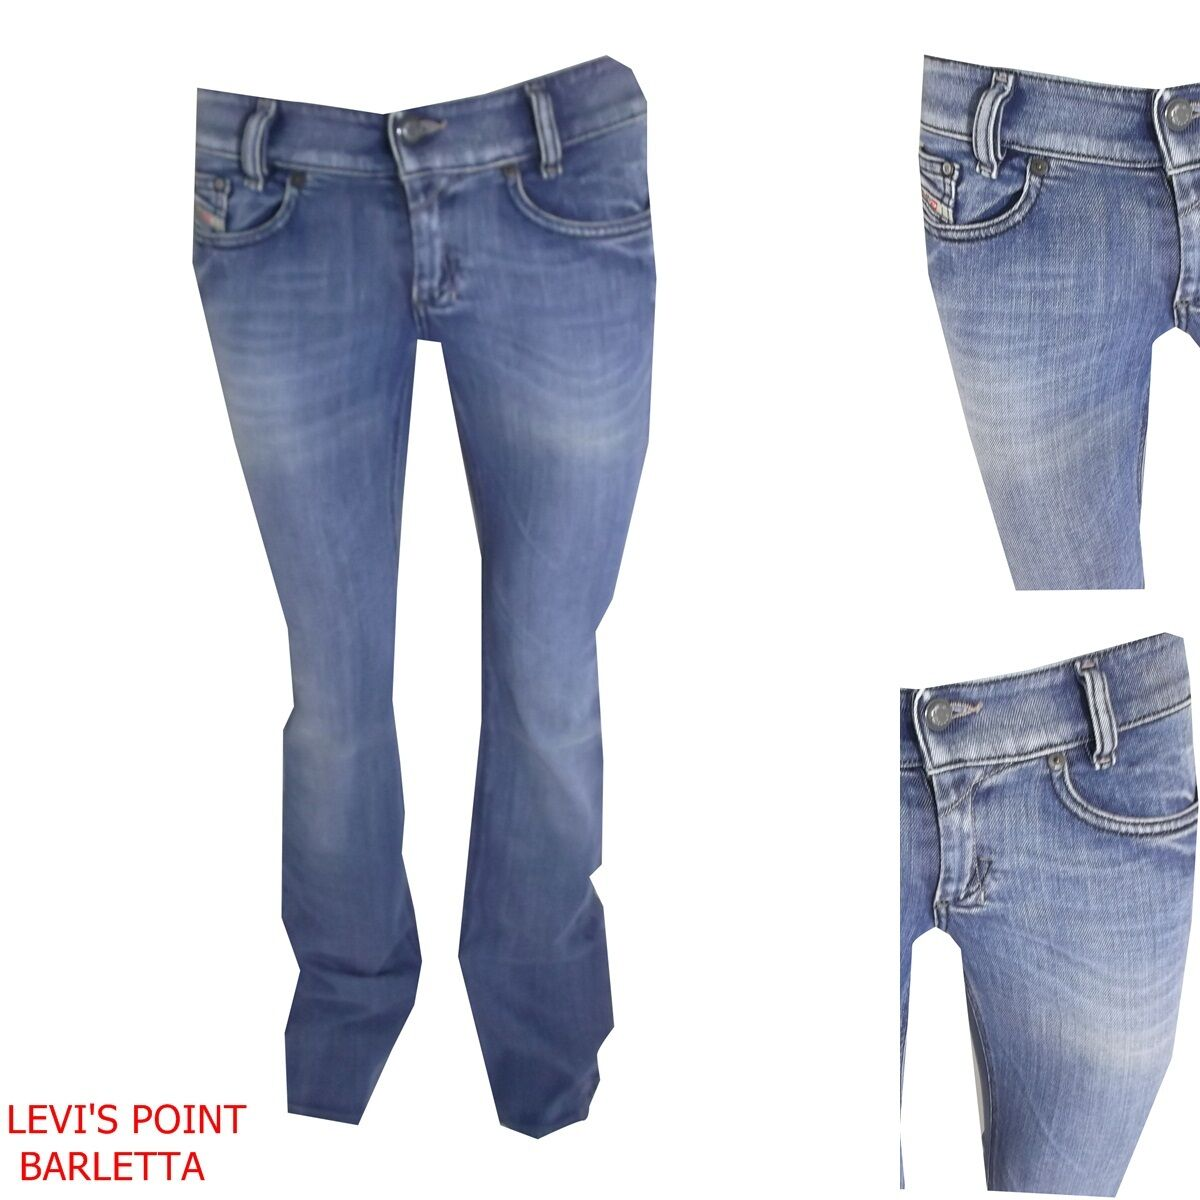 Jeans Diesel  Louvely Donna Stretch Stretch Stretch A Zampa D'elefante Tg W26 27 28 29 30 31 32 d7deb1